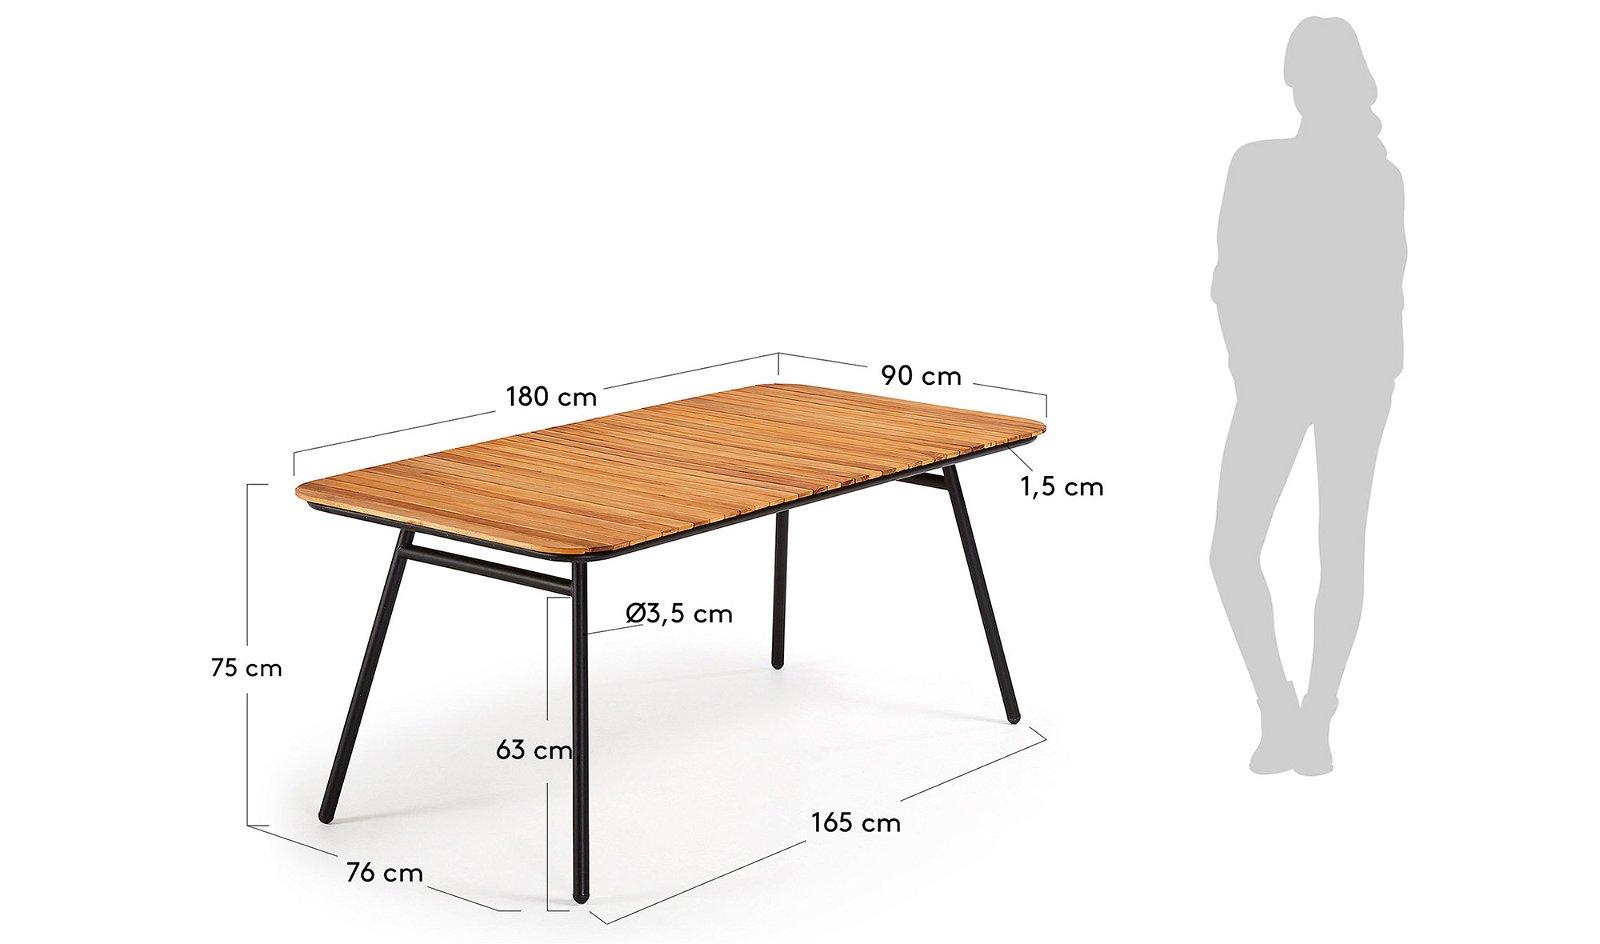 Mesa de comedor acacia natural Doska